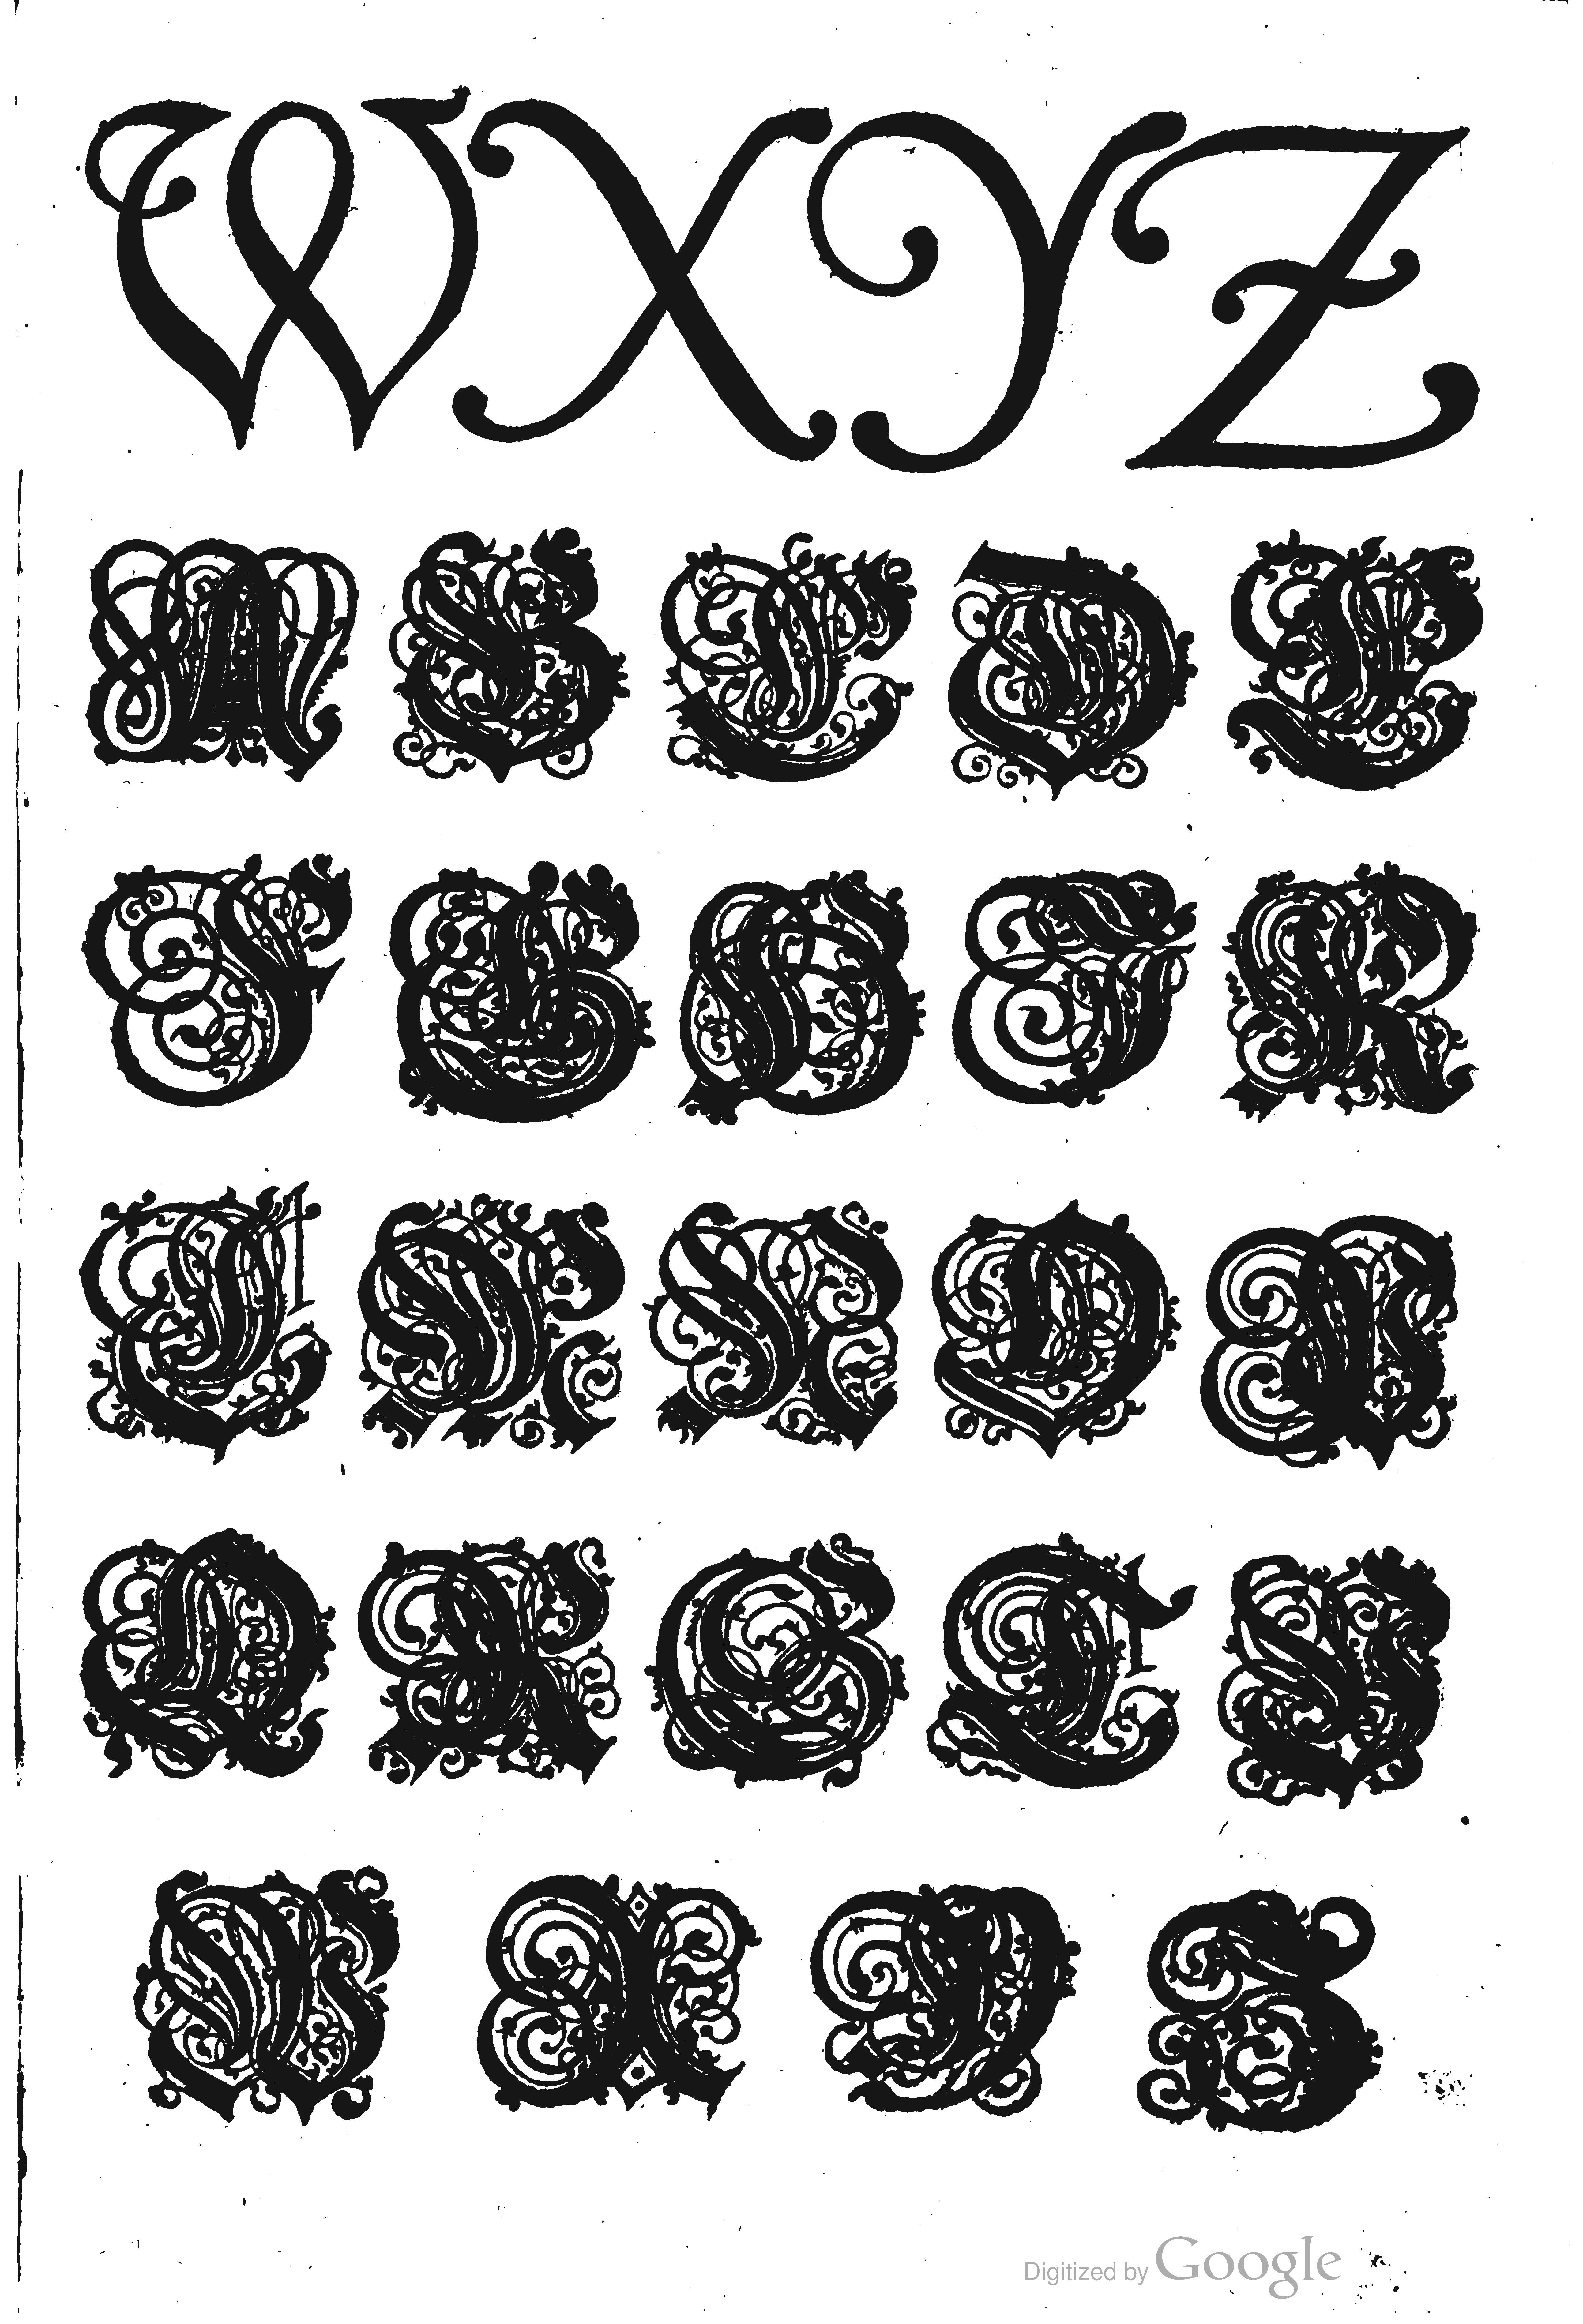 Swash italic capitals by Paulus Franck (1601).